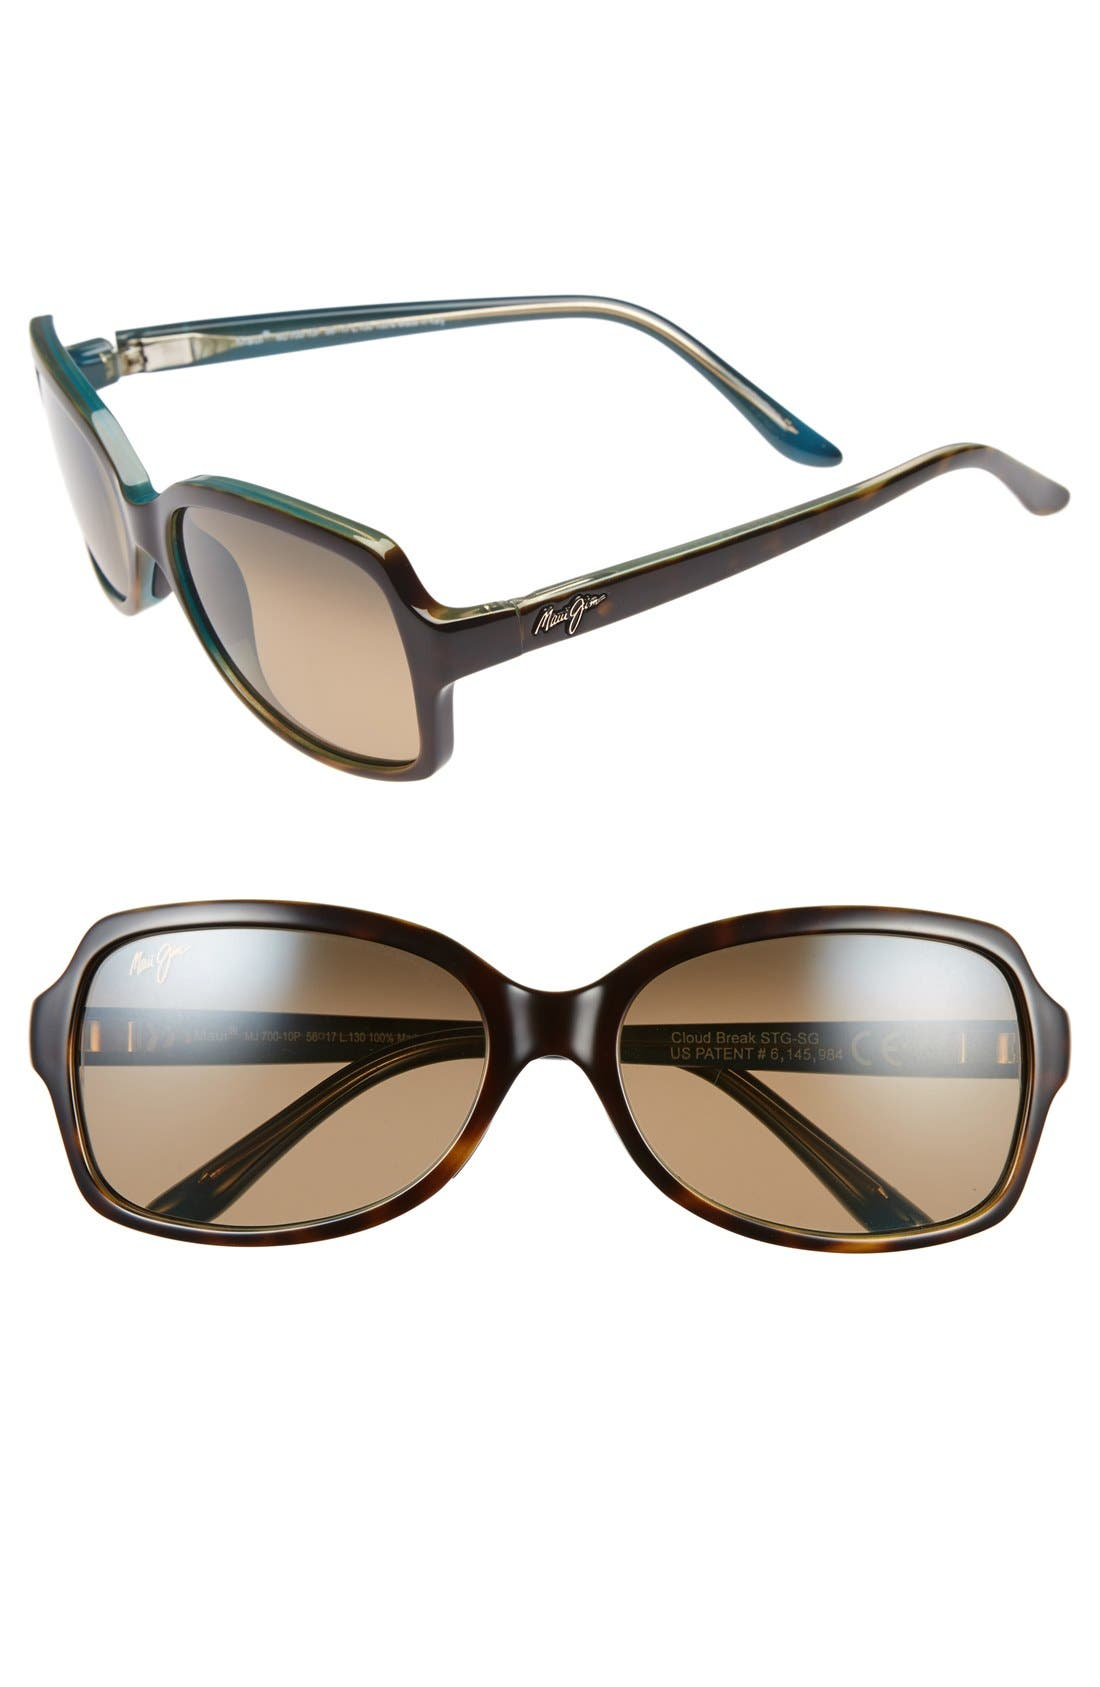 Cloud Break 56mm PolarizedPlus2<sup>®</sup> Sunglasses,                         Main,                         color, Tortoise Peacock/ Blue/ Bronze